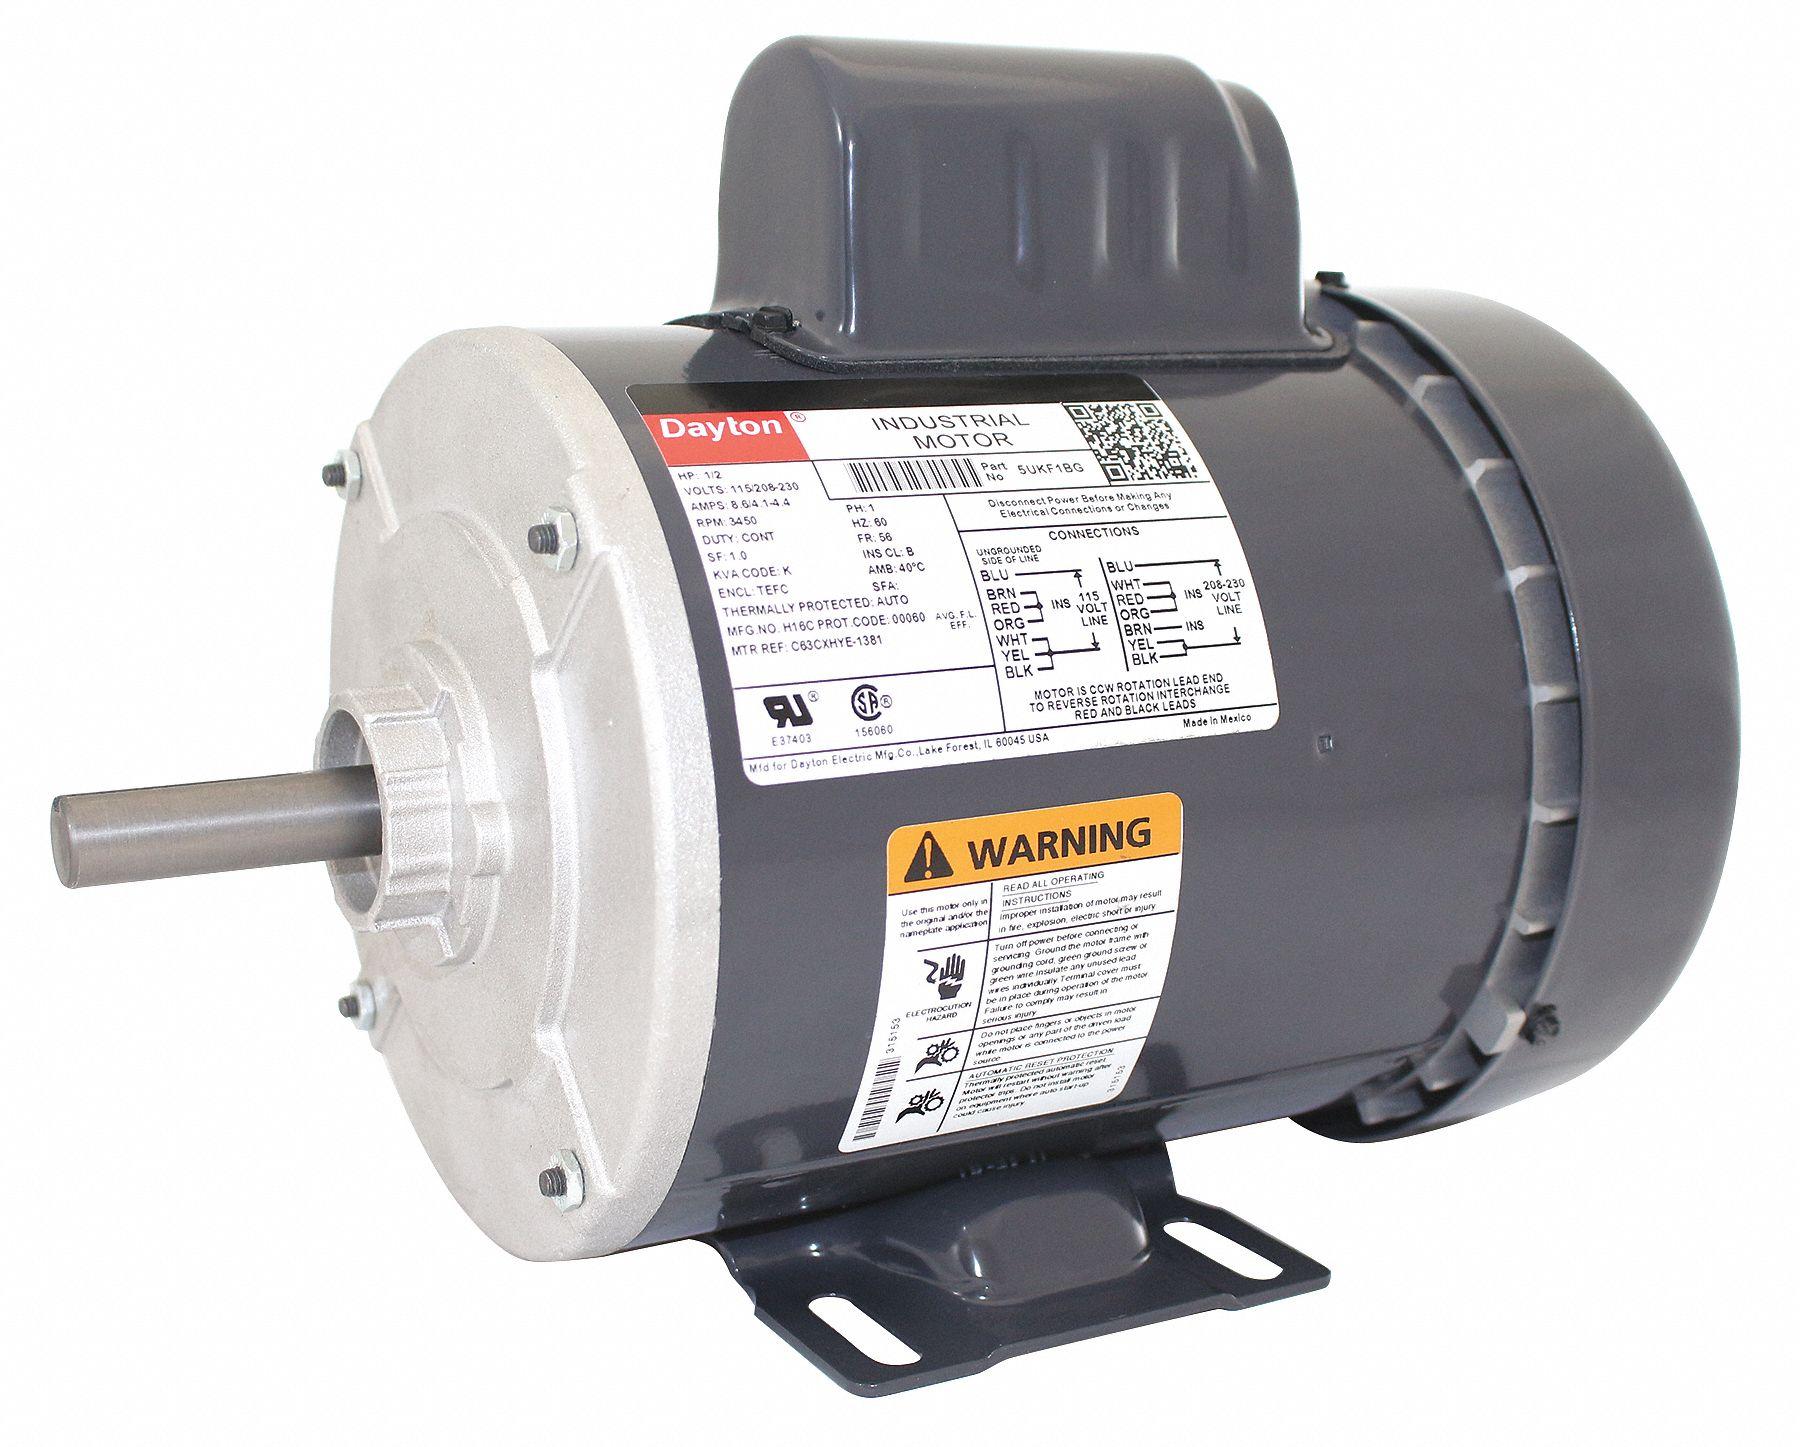 hight resolution of dayton 1 2 hp general purpose motor capacitor start 3450 nameplate rpm voltage 115 208 230 frame 56 5ukf1 5ukf1 grainger